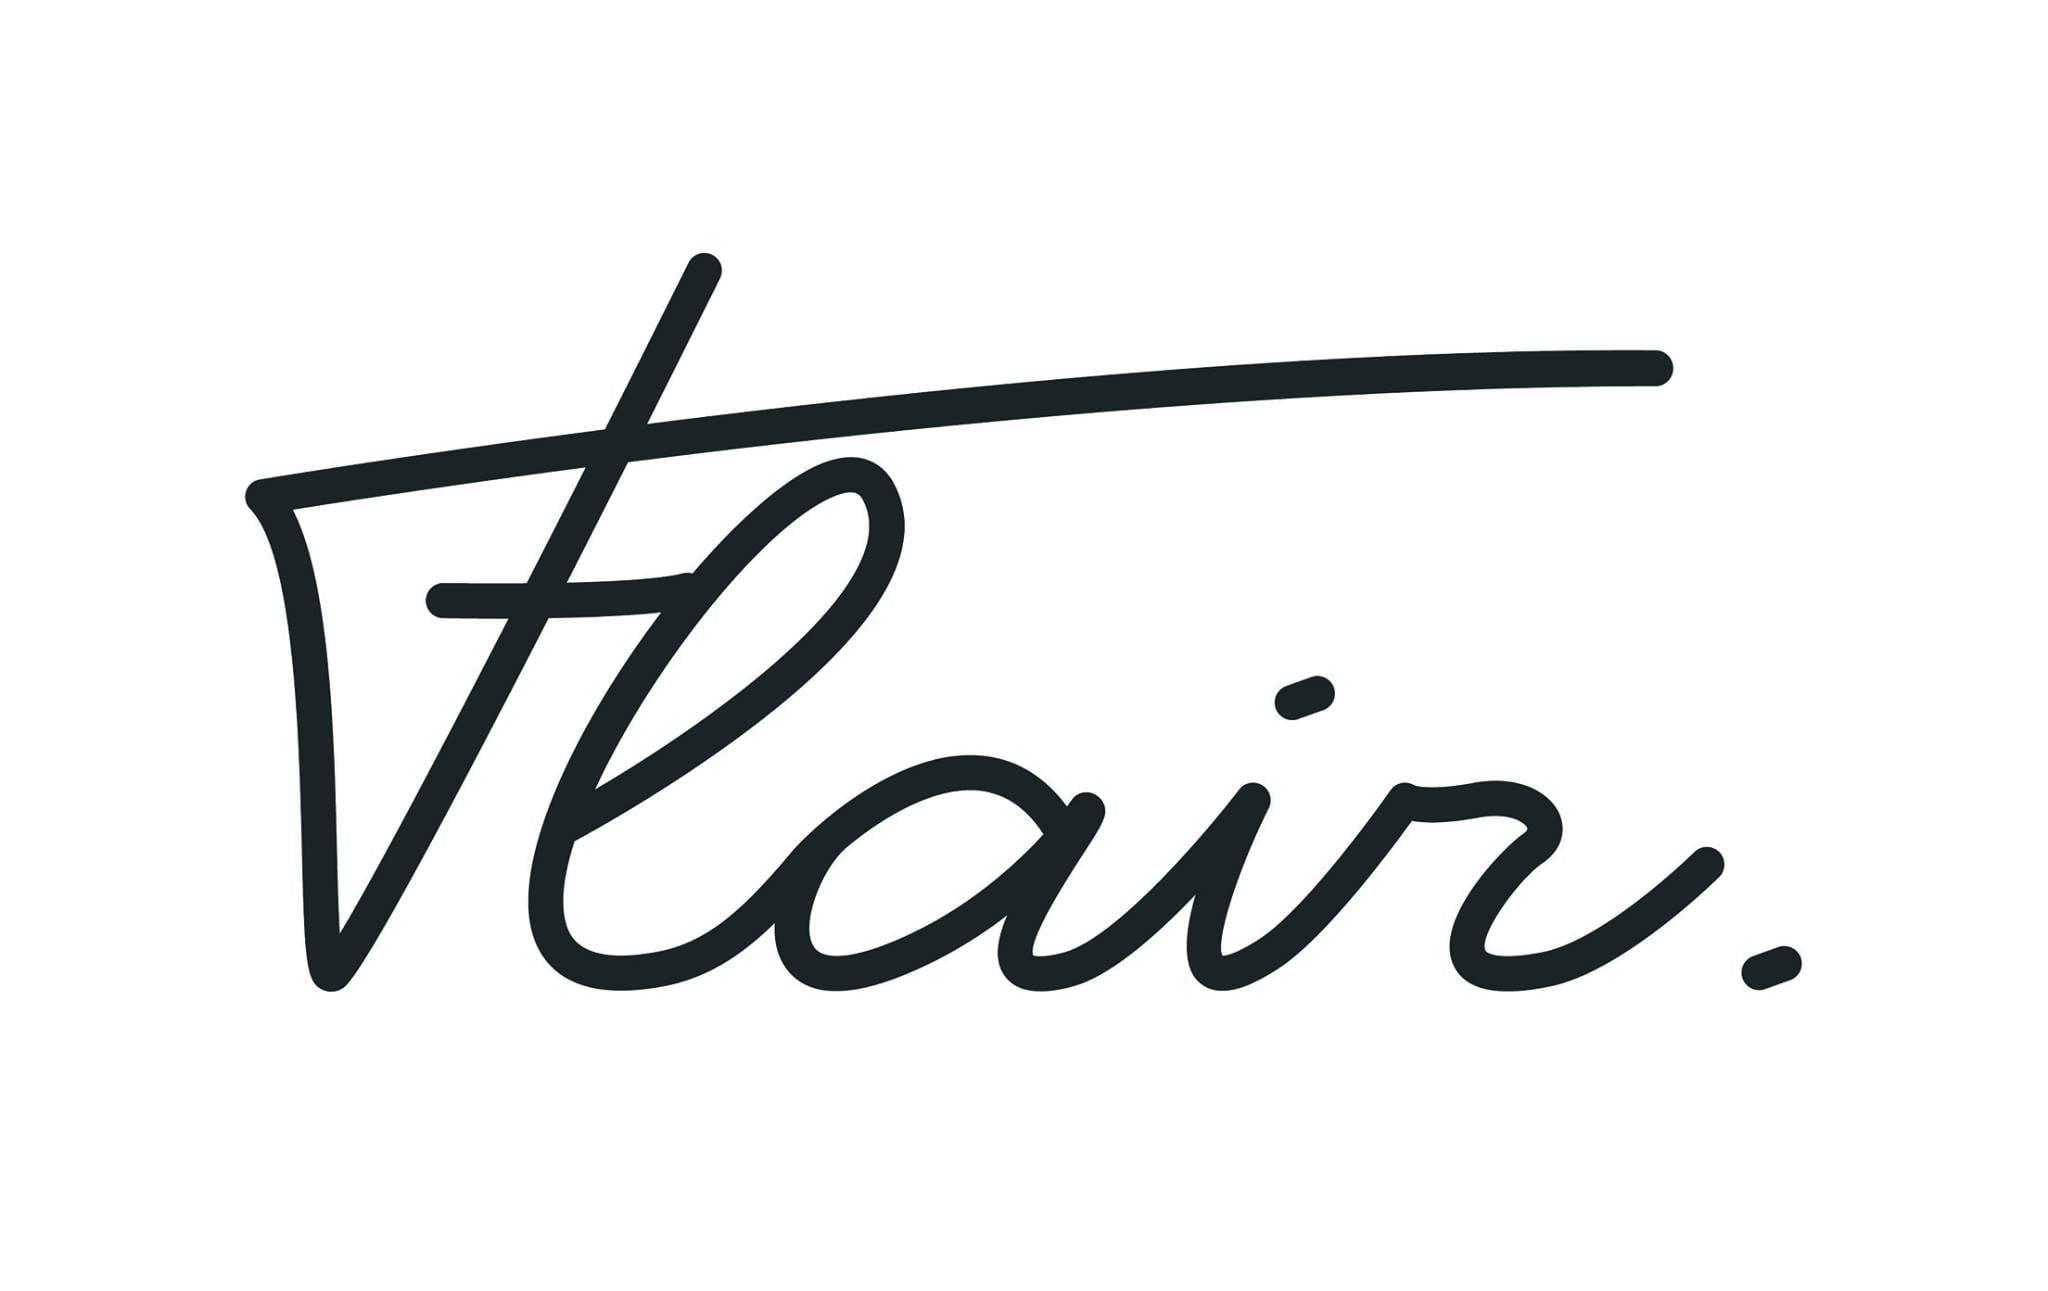 https://www.marques-de-france.fr/wp-content/uploads/2019/08/Flair_logo.jpg